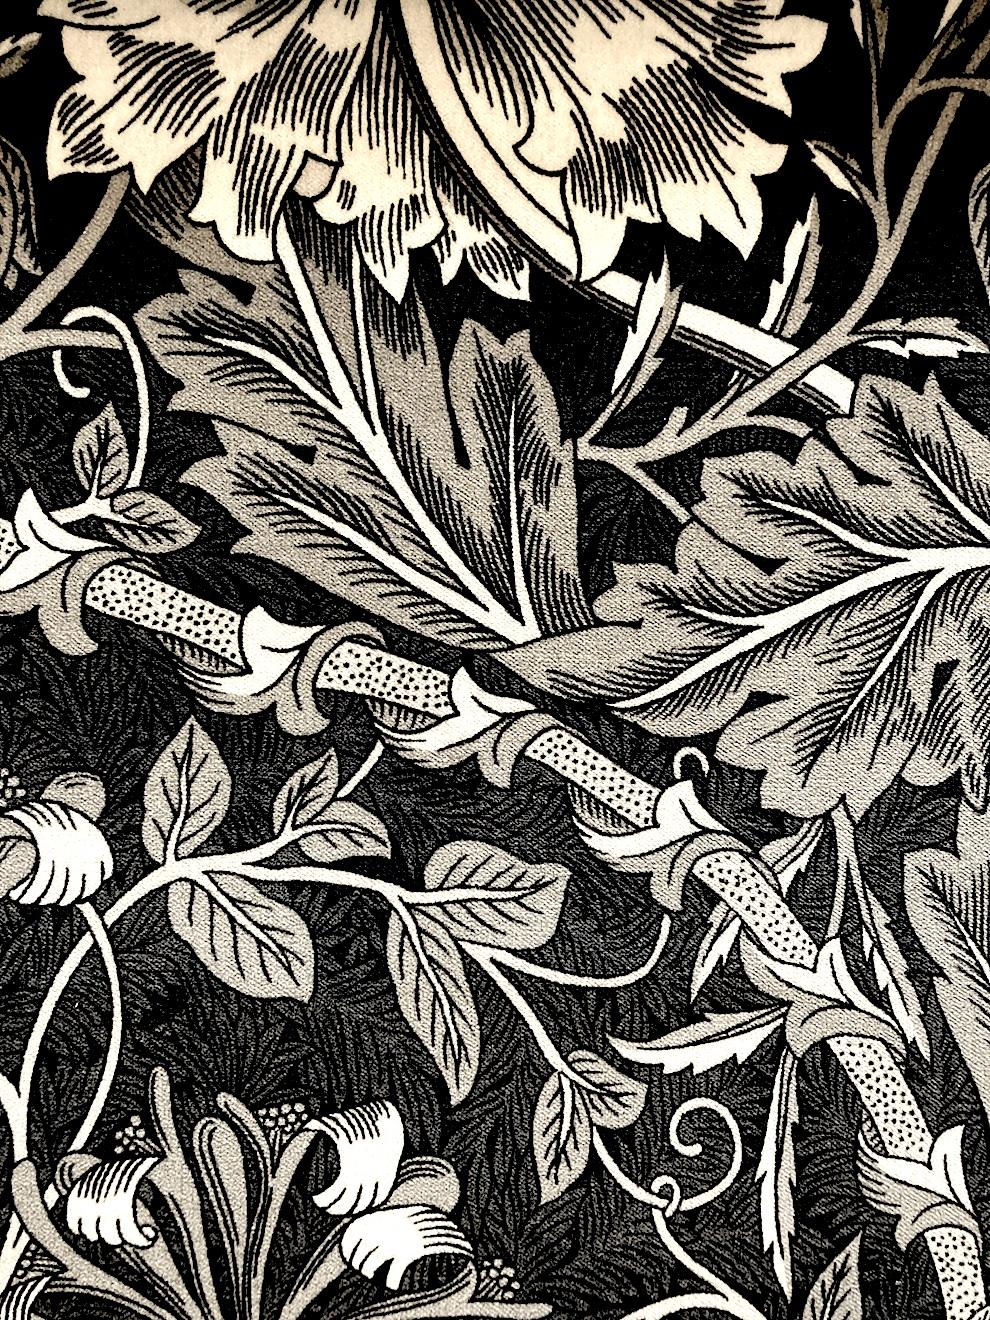 "W.モリス ベルベットプリントコレクション""Honeysuckle&Tulip Velvet236938 133cmx1m以上10cm単位でカット販売 (海外取寄せ)"